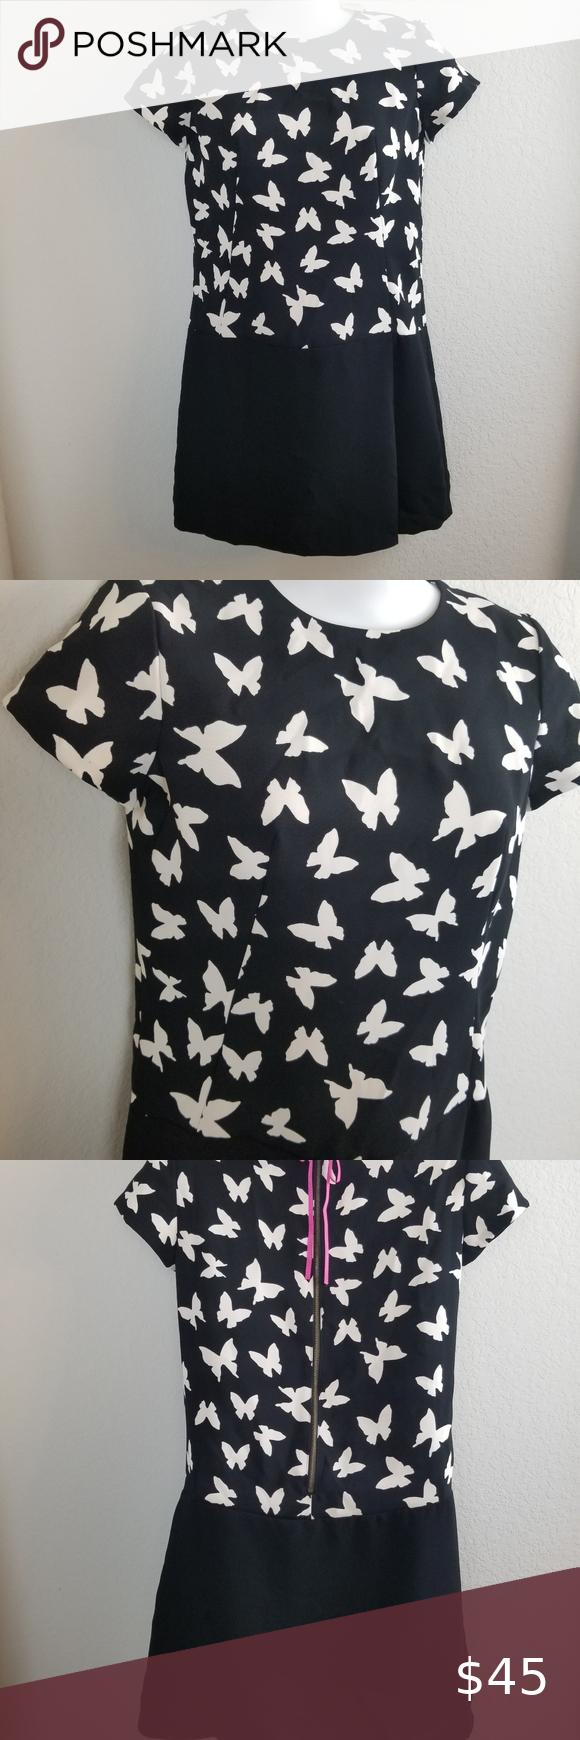 Loft Shift Dress With Butterflies Size Op Shift Dress Clothes Design Dresses [ 1740 x 580 Pixel ]